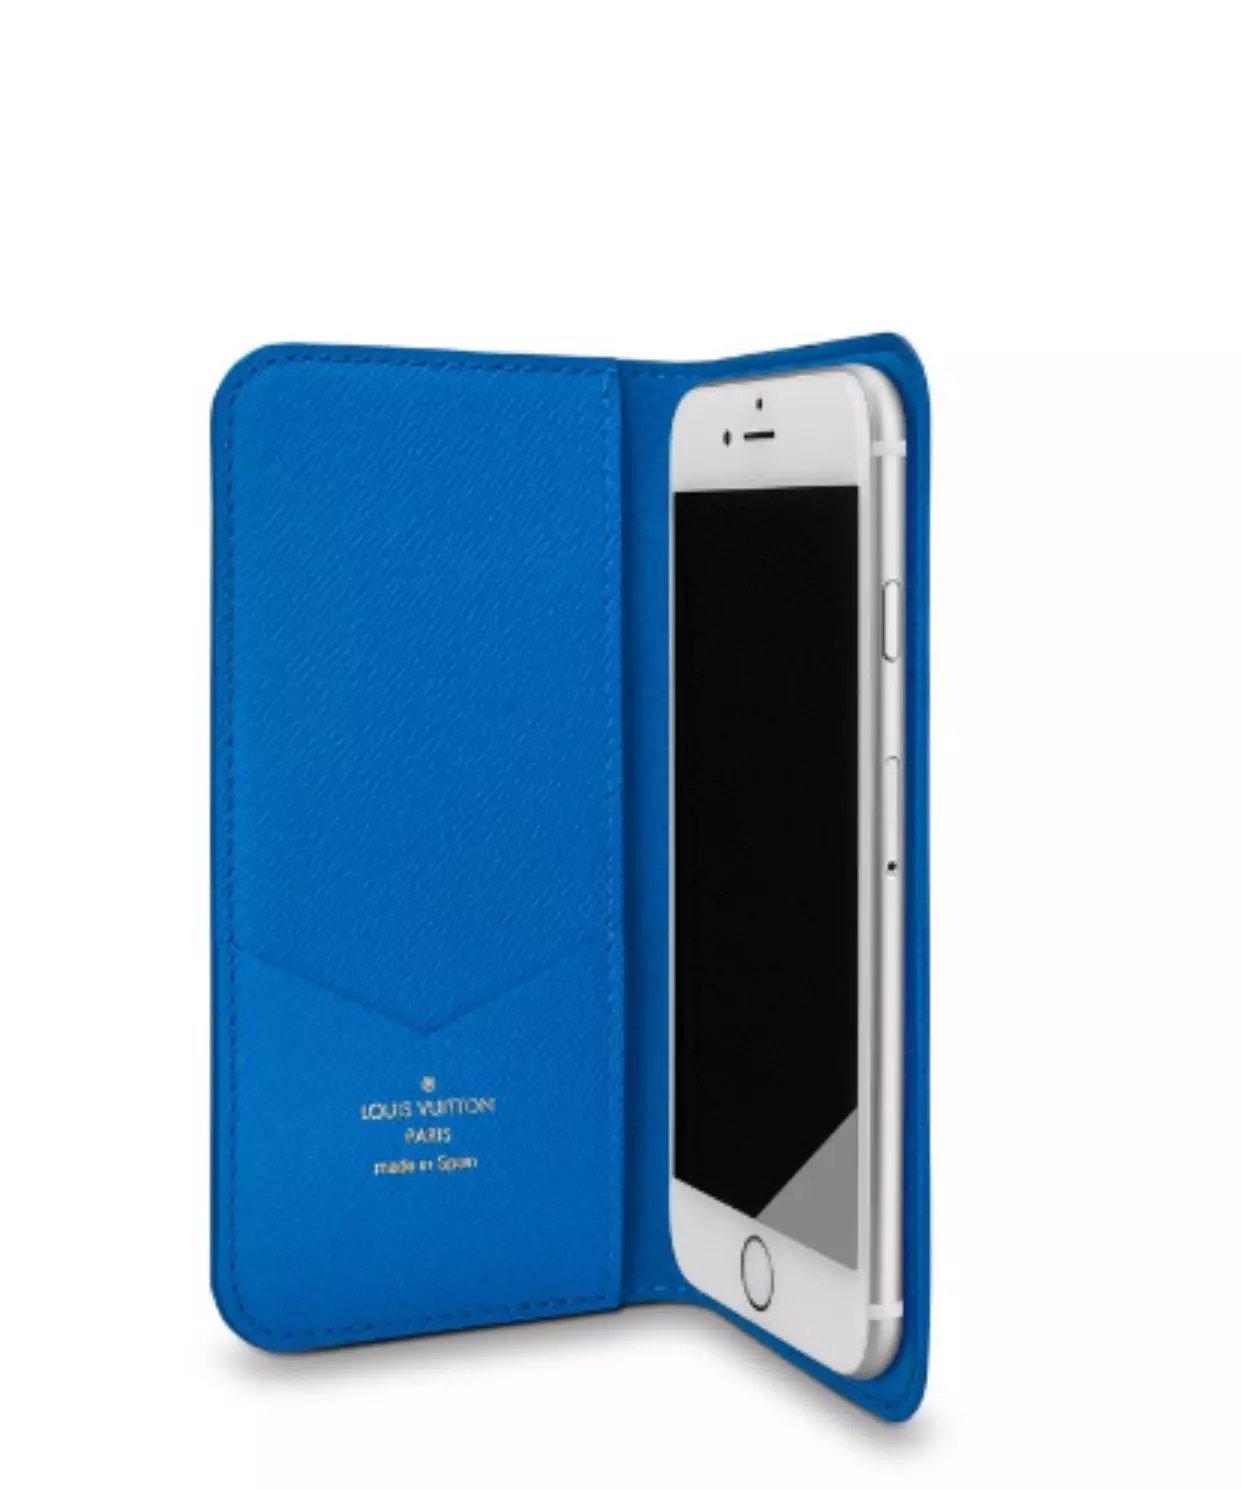 designer iphone hüllen iphone case gestalten Louis Vuitton iphone7 hülle iphone 7 taubschutz erfahrungen mit iphone 7 7 handyhülle handyhüllen für iphone 7 wann kommt das iphone 6 raus handyhülle iphone 7 7lbst gestalten